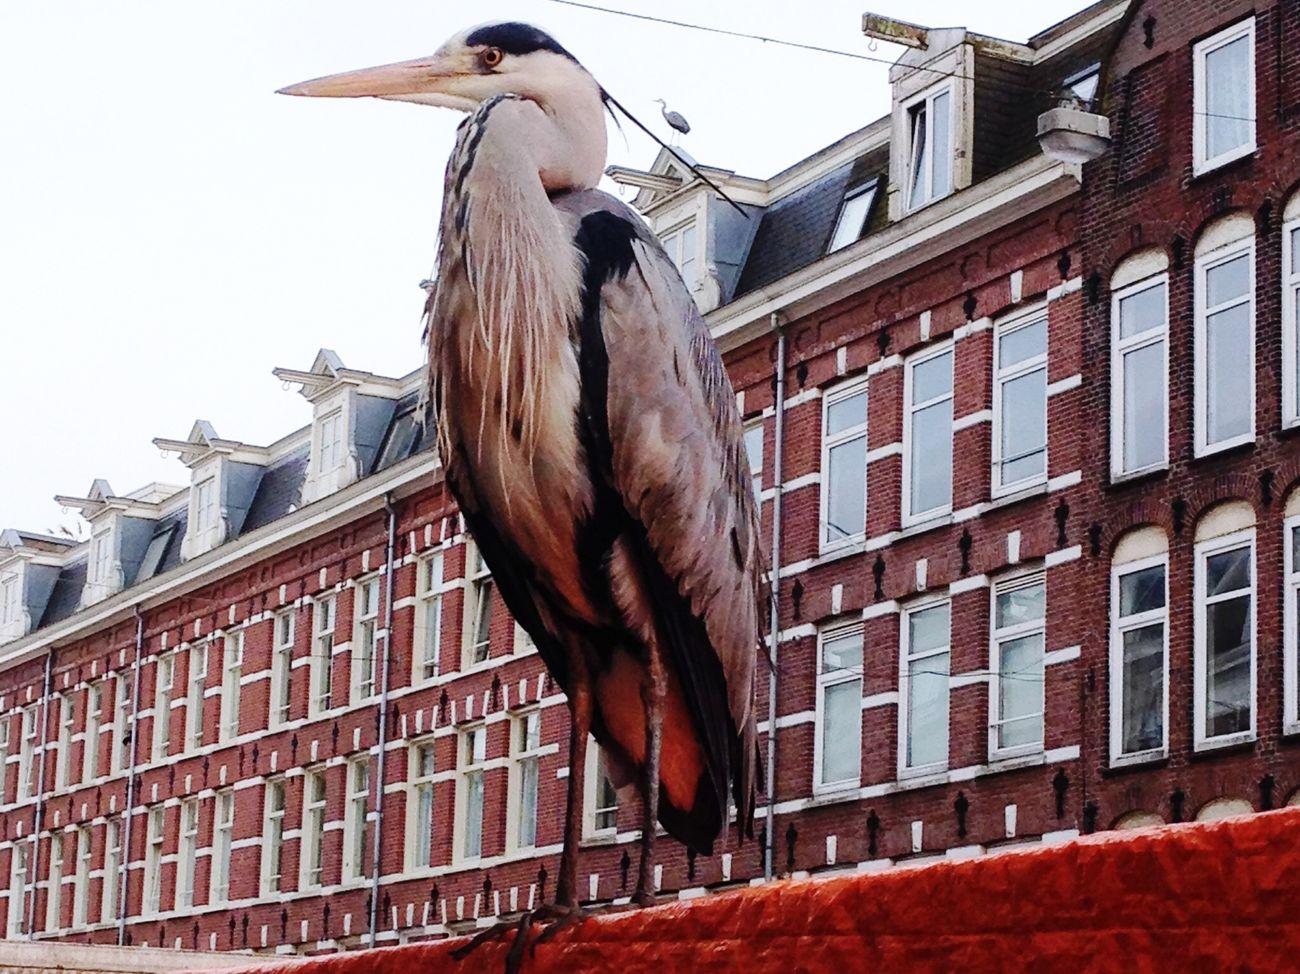 Amsterdam Market Reiger Albert Cuyp Canals Birds Egret Attitude Fish